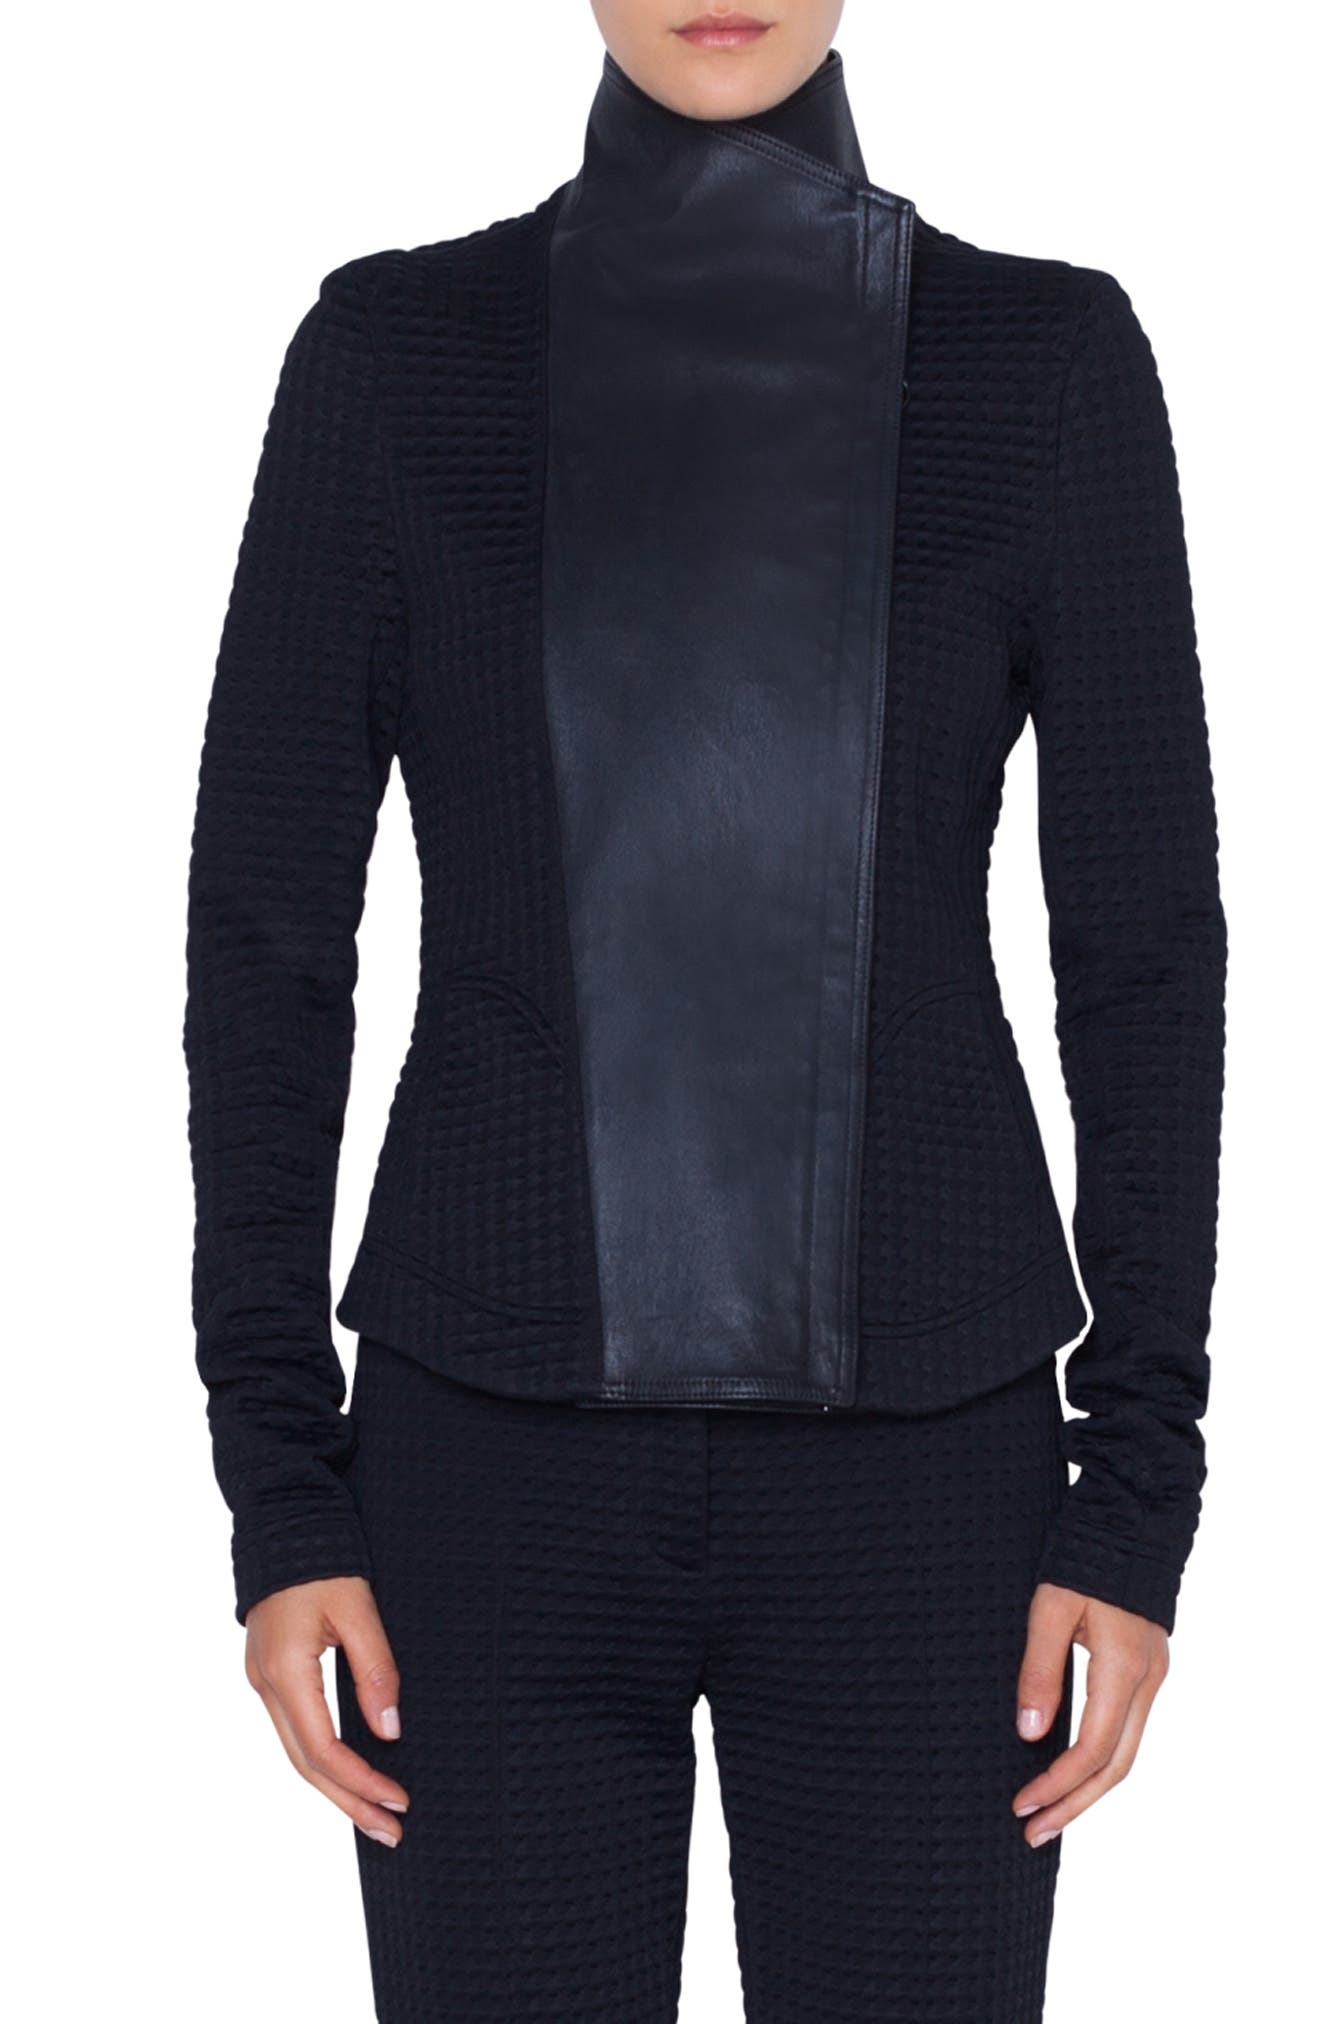 AKRIS PUNTO, Leather & Jersey Biker Jacket, Main thumbnail 1, color, NERO